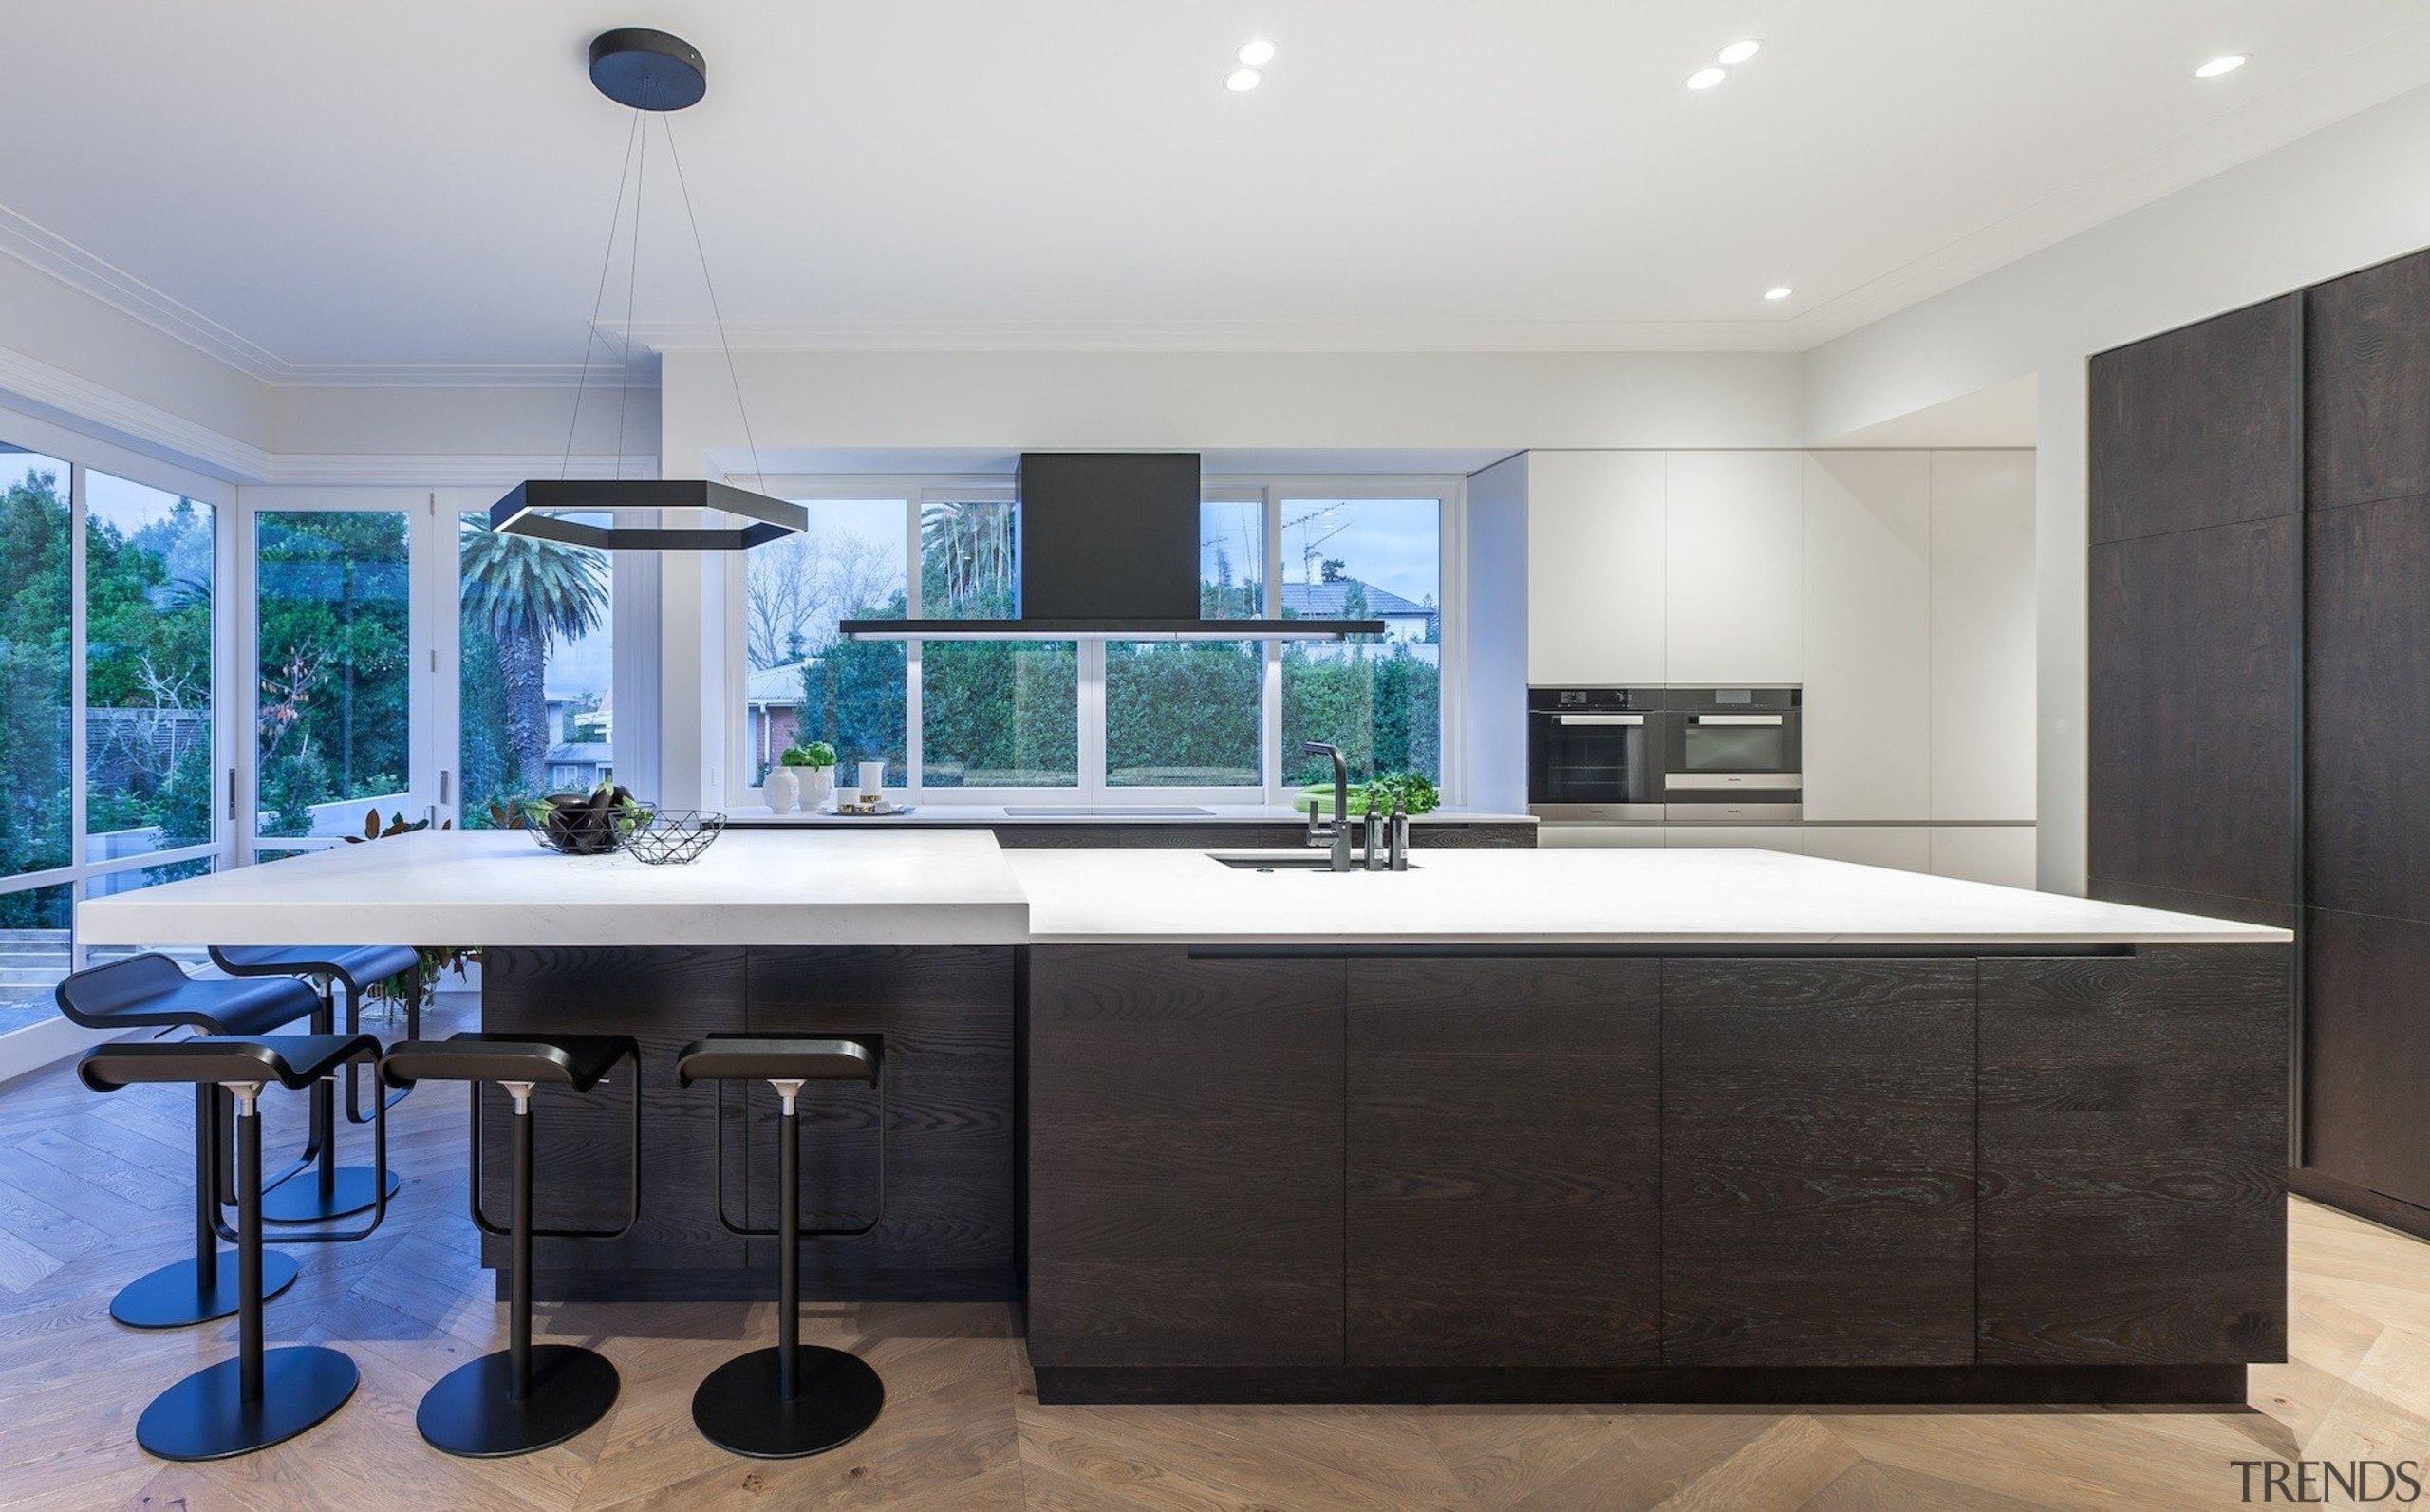 Cronin Kitchens – TIDA New Zealand Designer countertop, interior design, kitchen, real estate, room, black, white